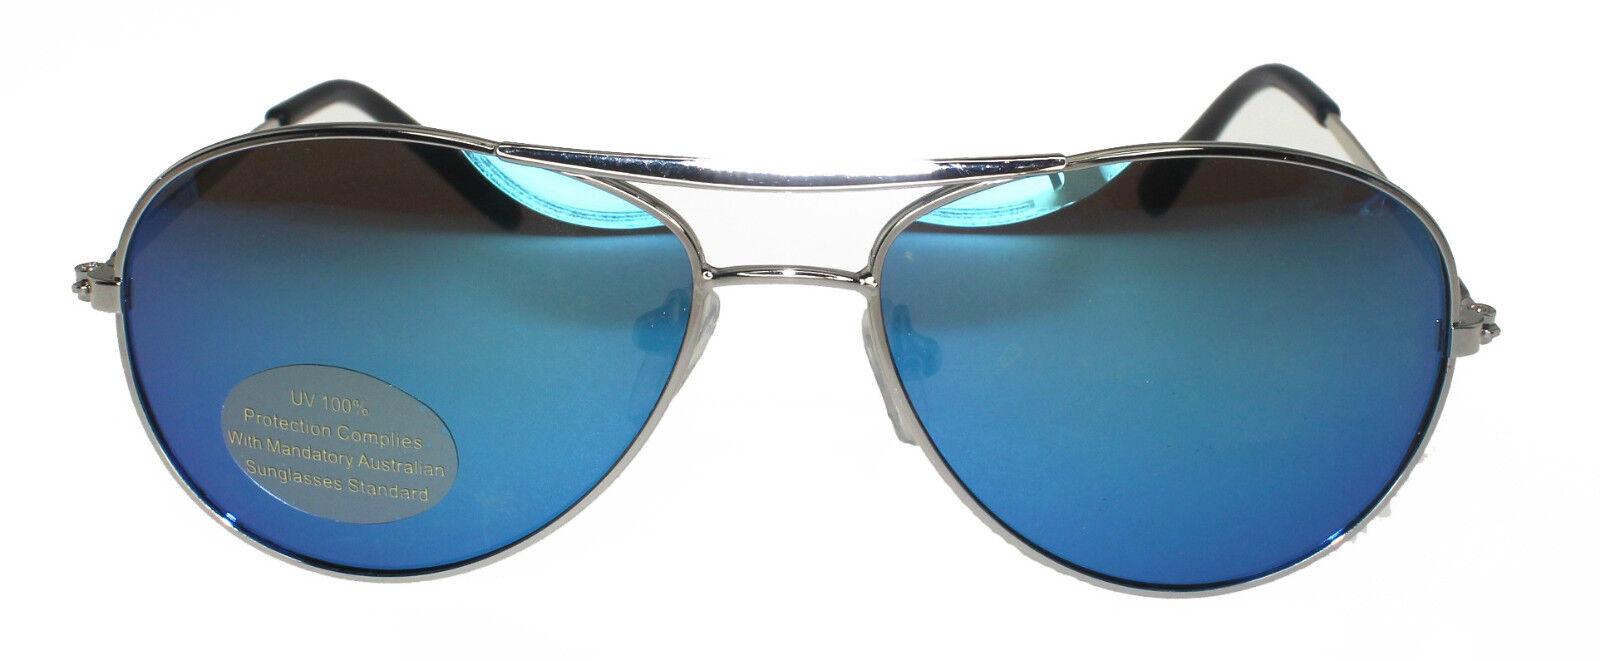 Kid Boys Boy Girls Aviator Sunglasses Cute Mirrored ...